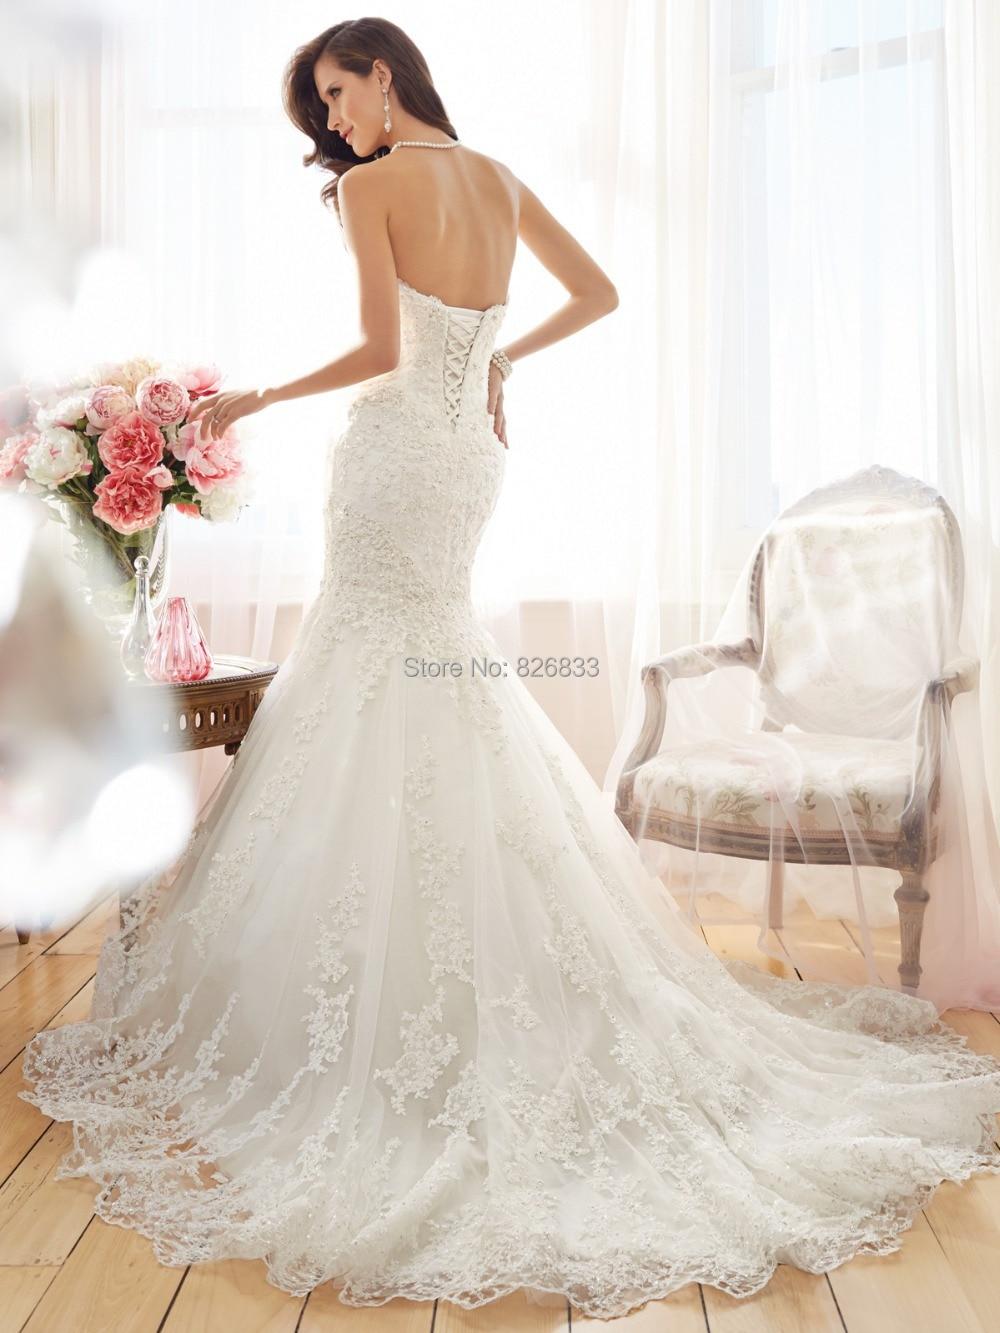 e6089eee6f6d Romantic Style Appliques Sweetheart Ivory Lace Mermaid Wedding Dresses  Corset Bridal Gowns 2015 Hot Sale-in Wedding Dresses from Weddings & Events  on ...